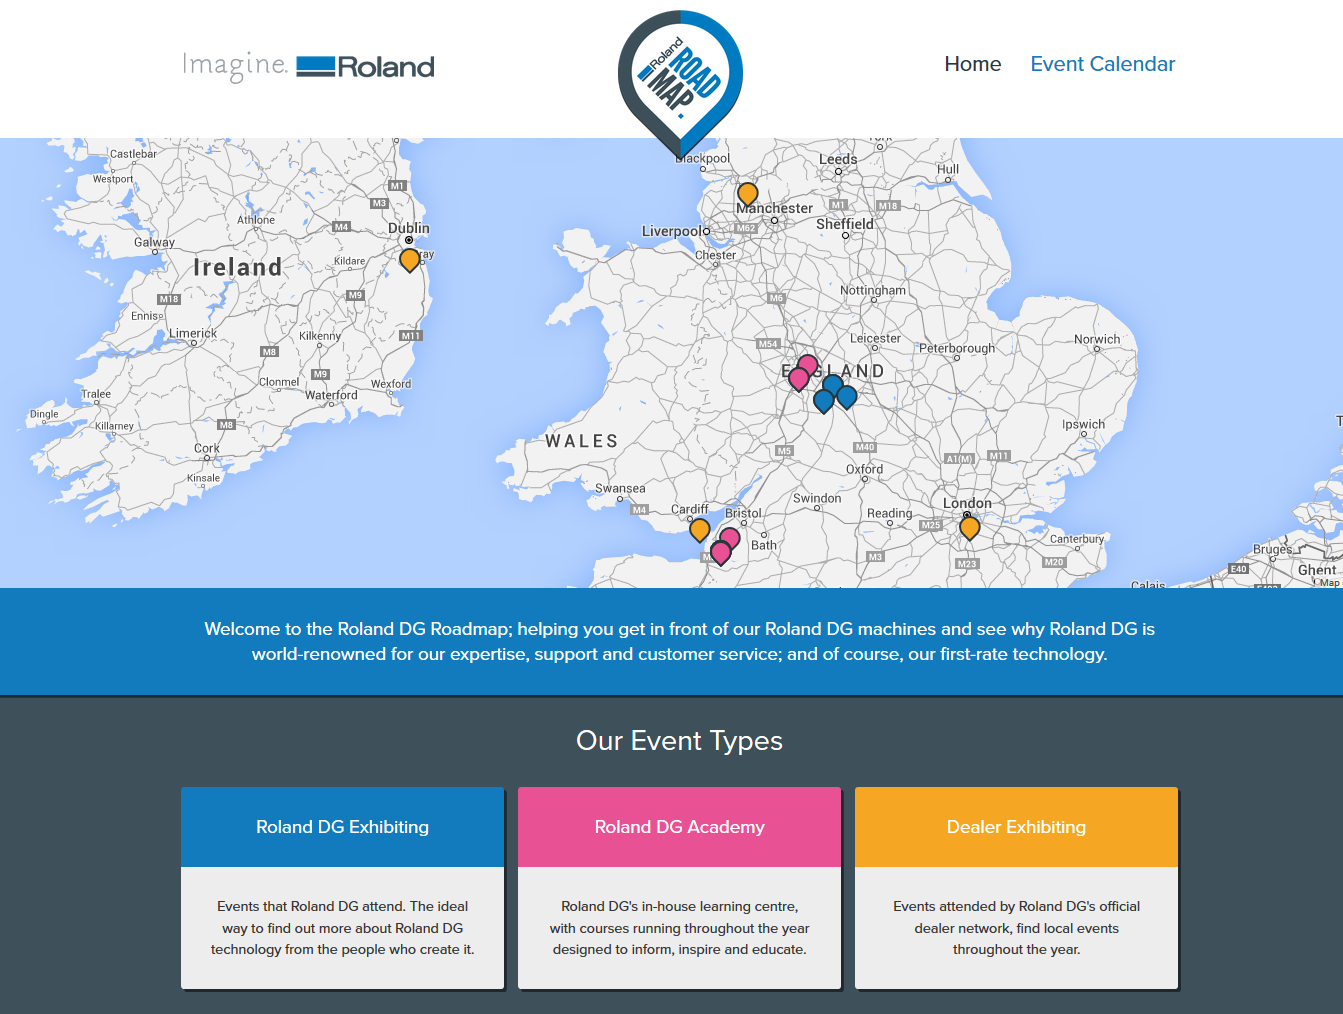 RolandDGRoadmap_homepage_screenshot